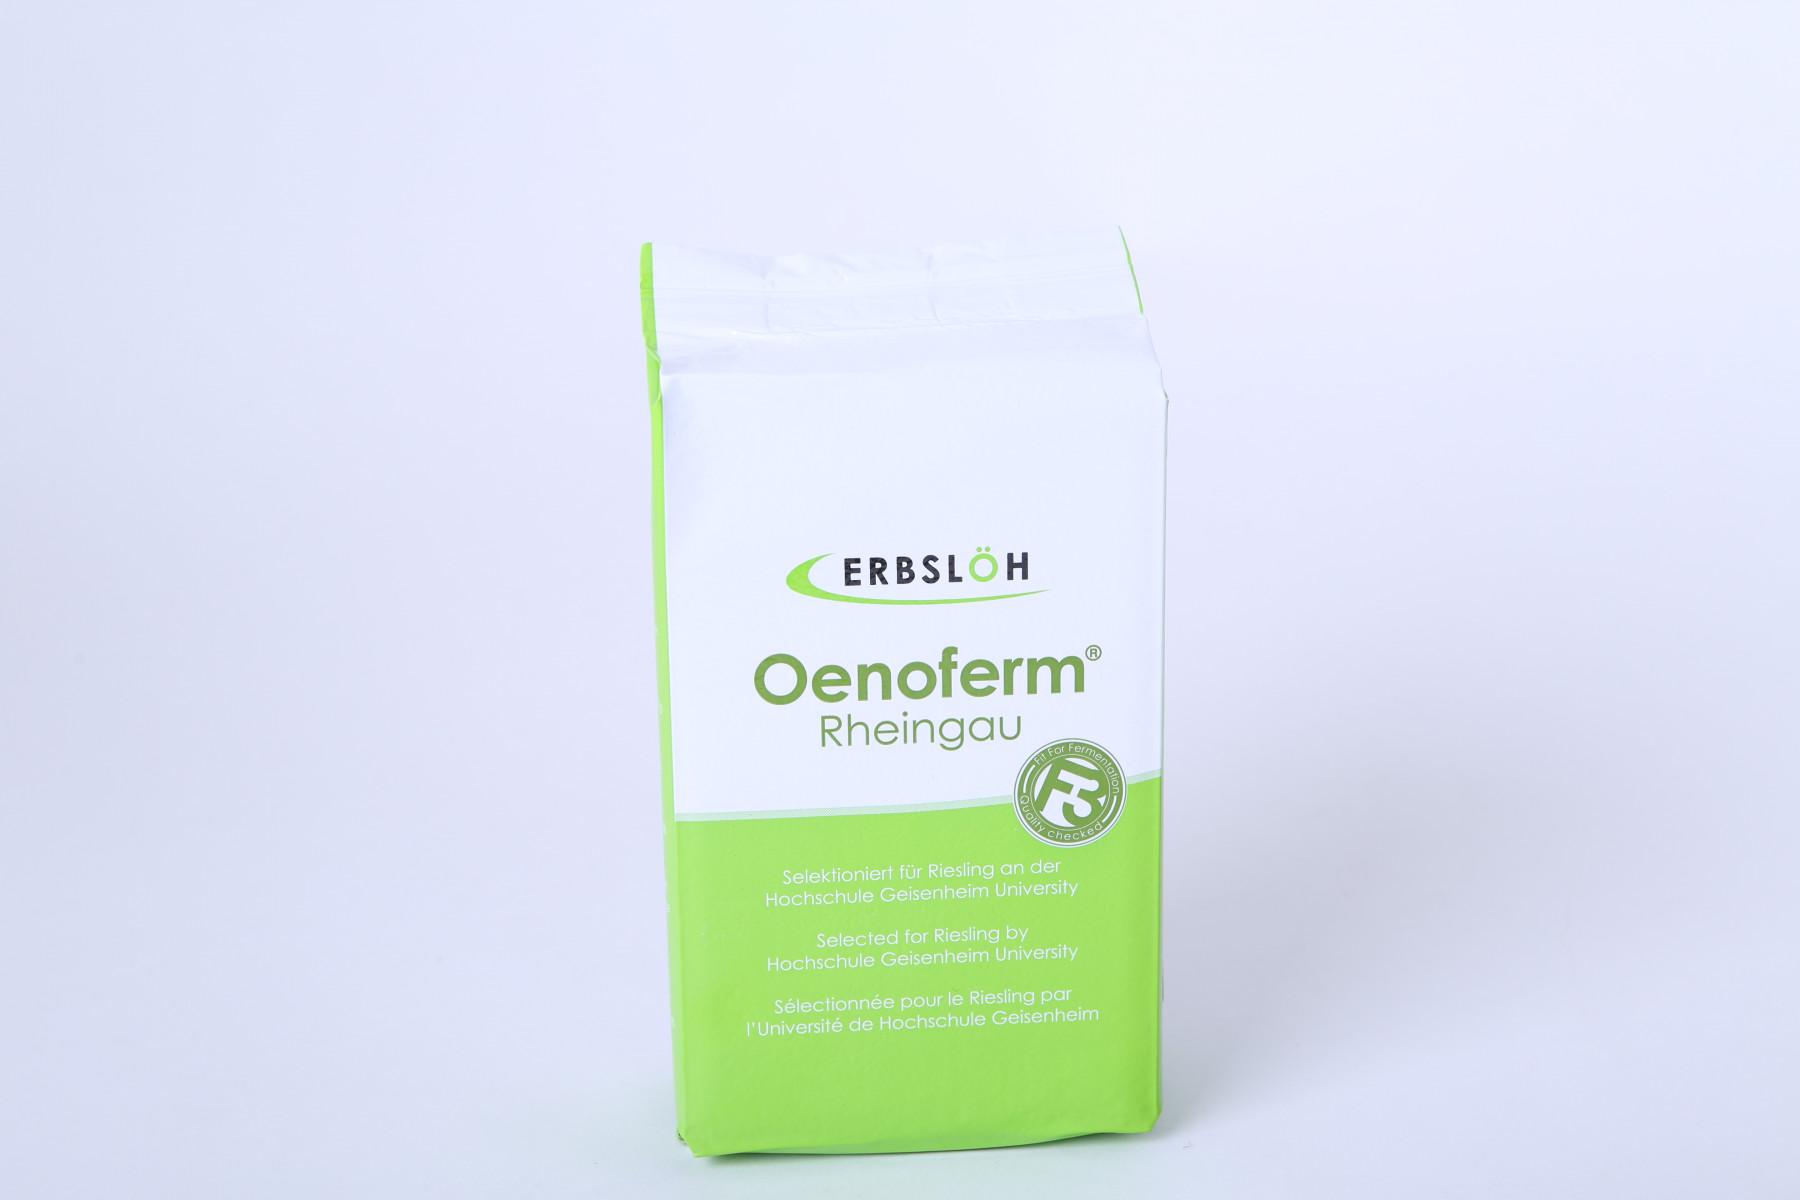 NOVÉ kvasinky Oenoferm® Rheingau F3